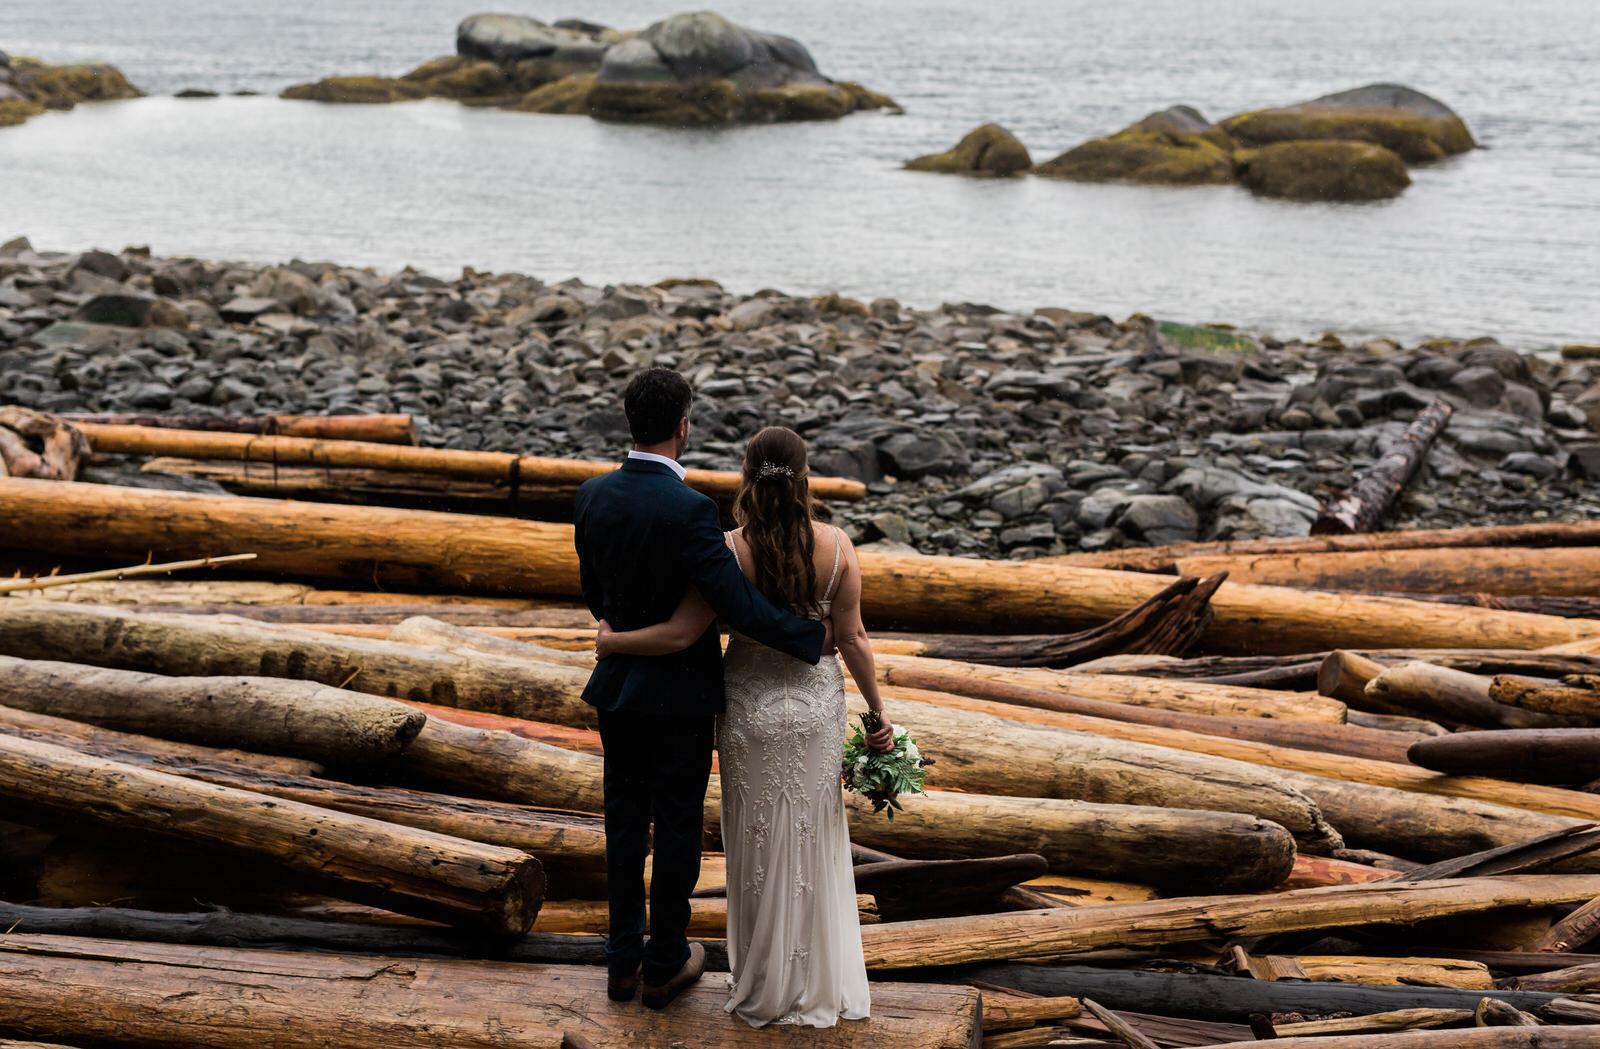 Sunshine Coast BC Elopement - Jennifer Picard Photography - Vancouver Wedding Photographer - IMG_6648.jpg